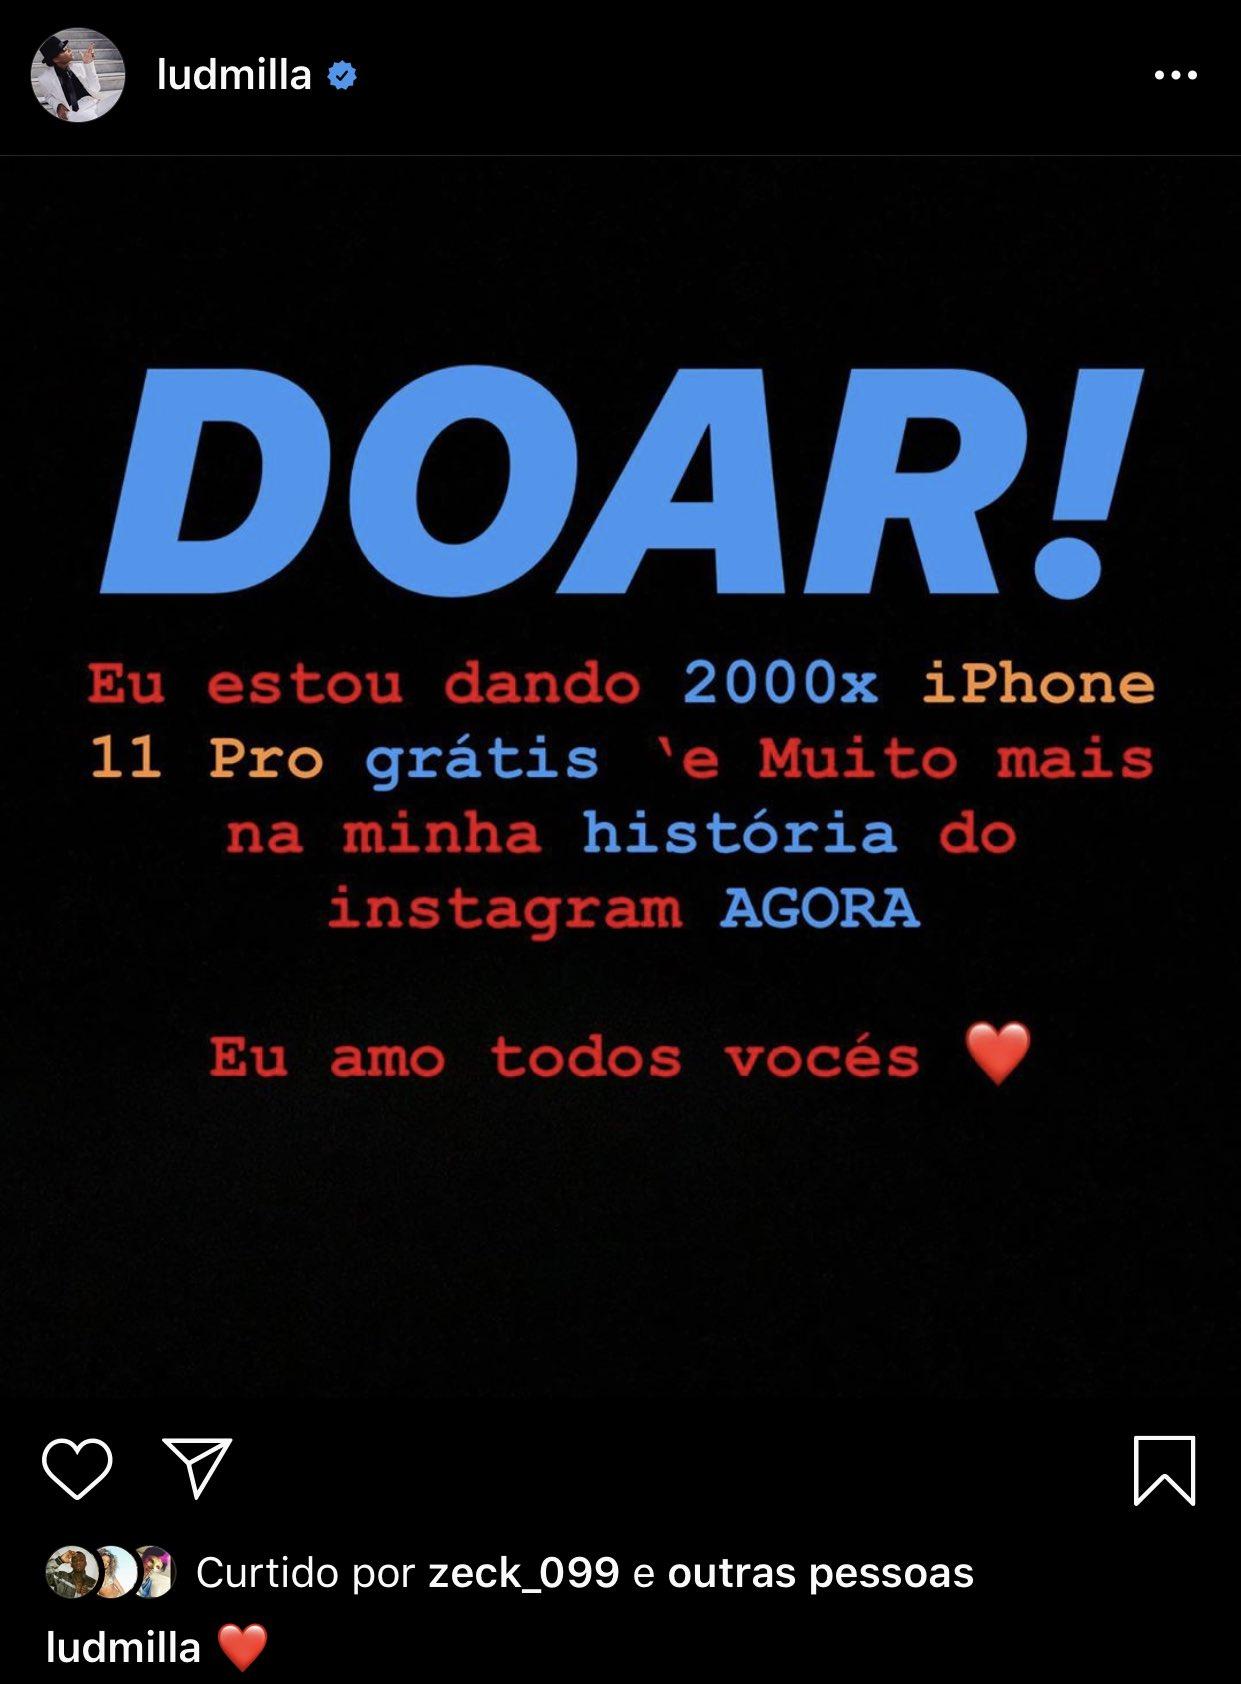 Com promessa de doar 2 mil iPhones 11 Pro, Ludmilla tem sua conta no Instagram hackeada